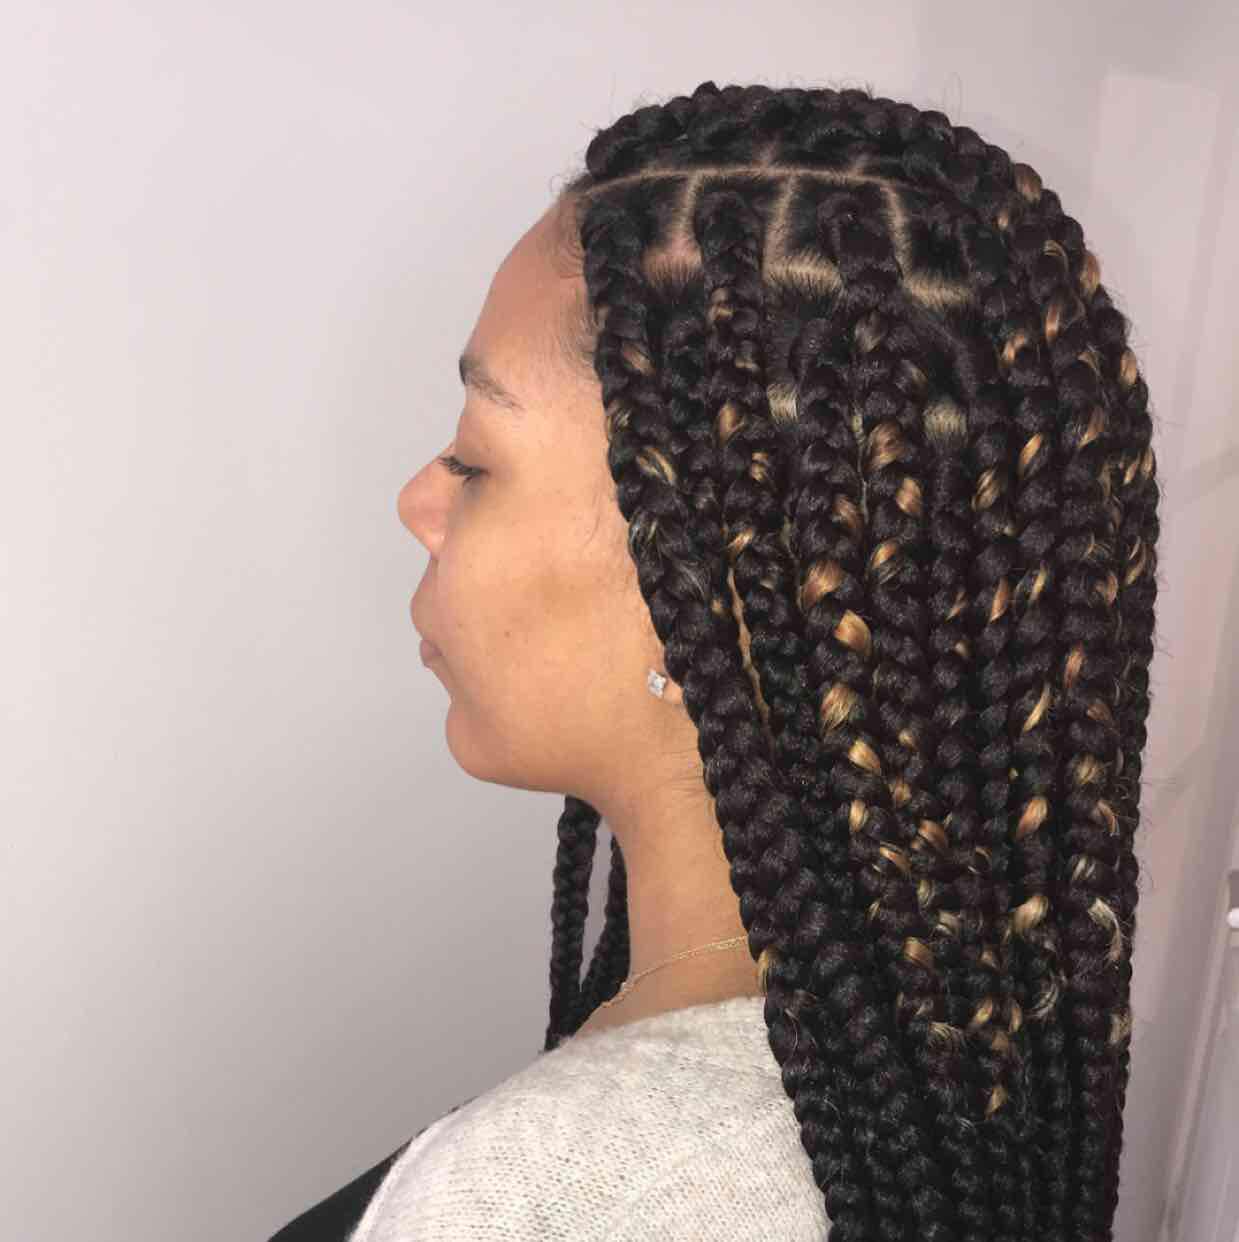 salon de coiffure afro tresse tresses box braids crochet braids vanilles tissages paris 75 77 78 91 92 93 94 95 HQMTINNA